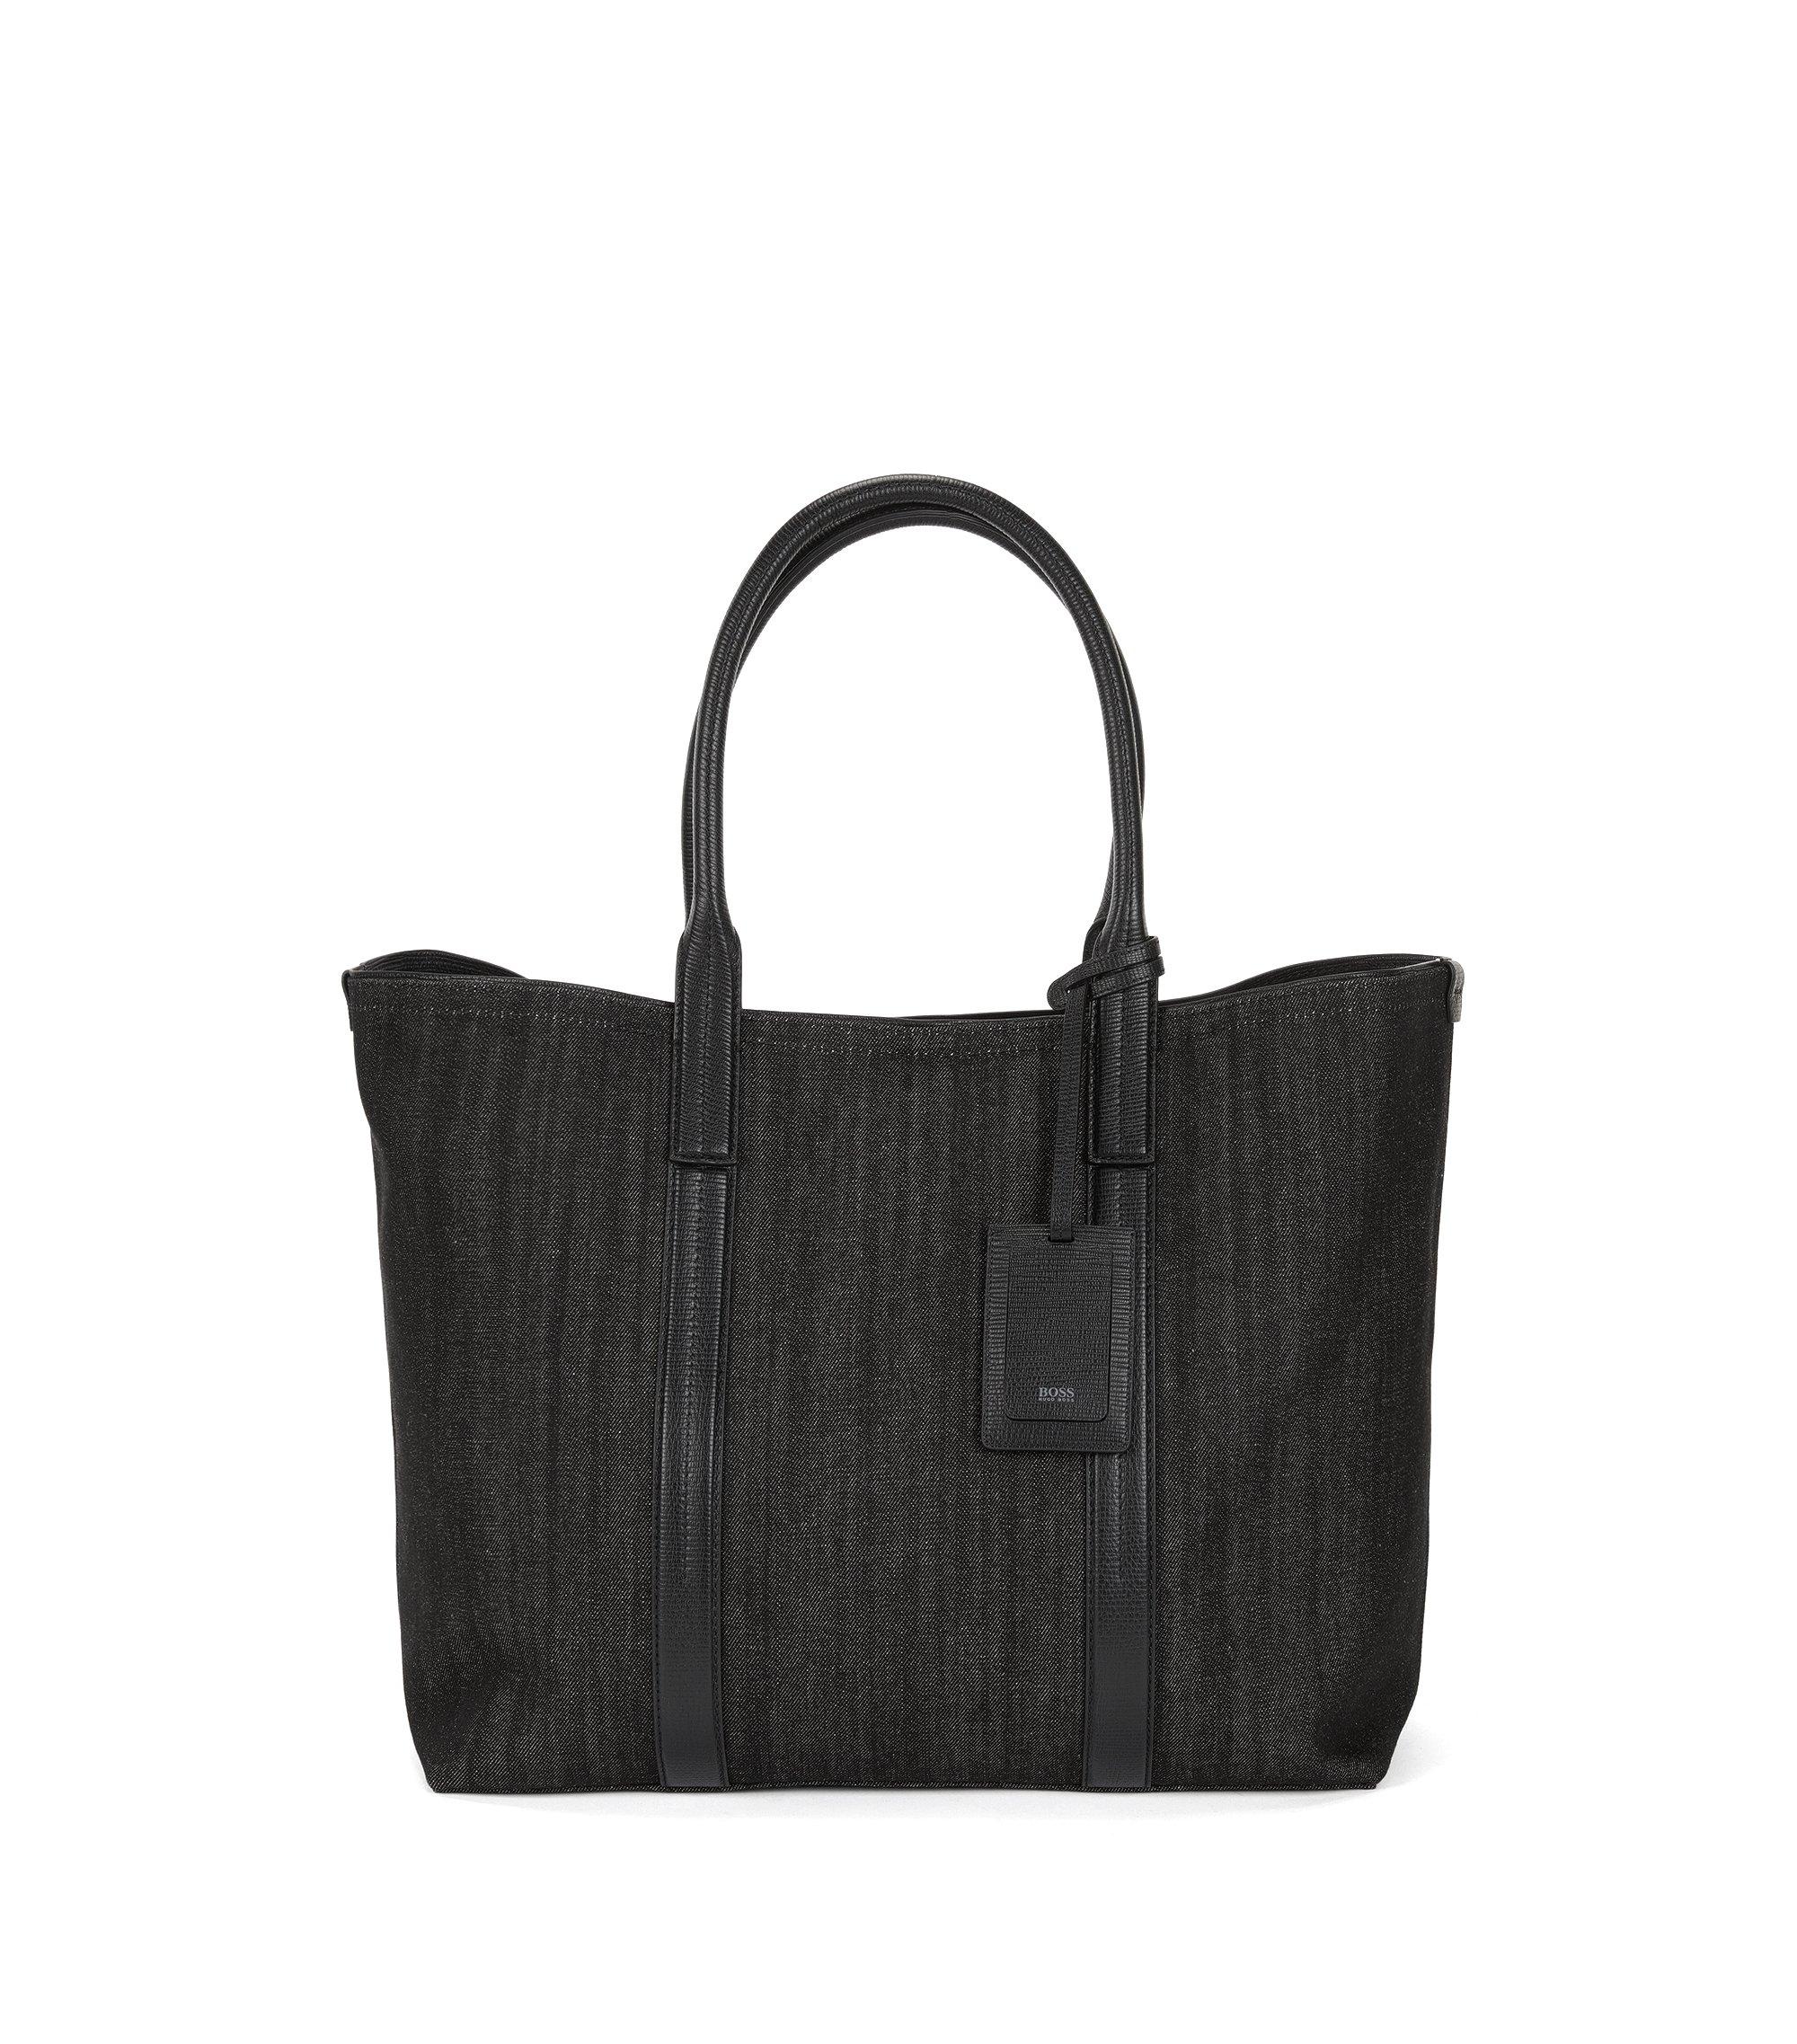 Italian-denim tote bag with leather trims, Black